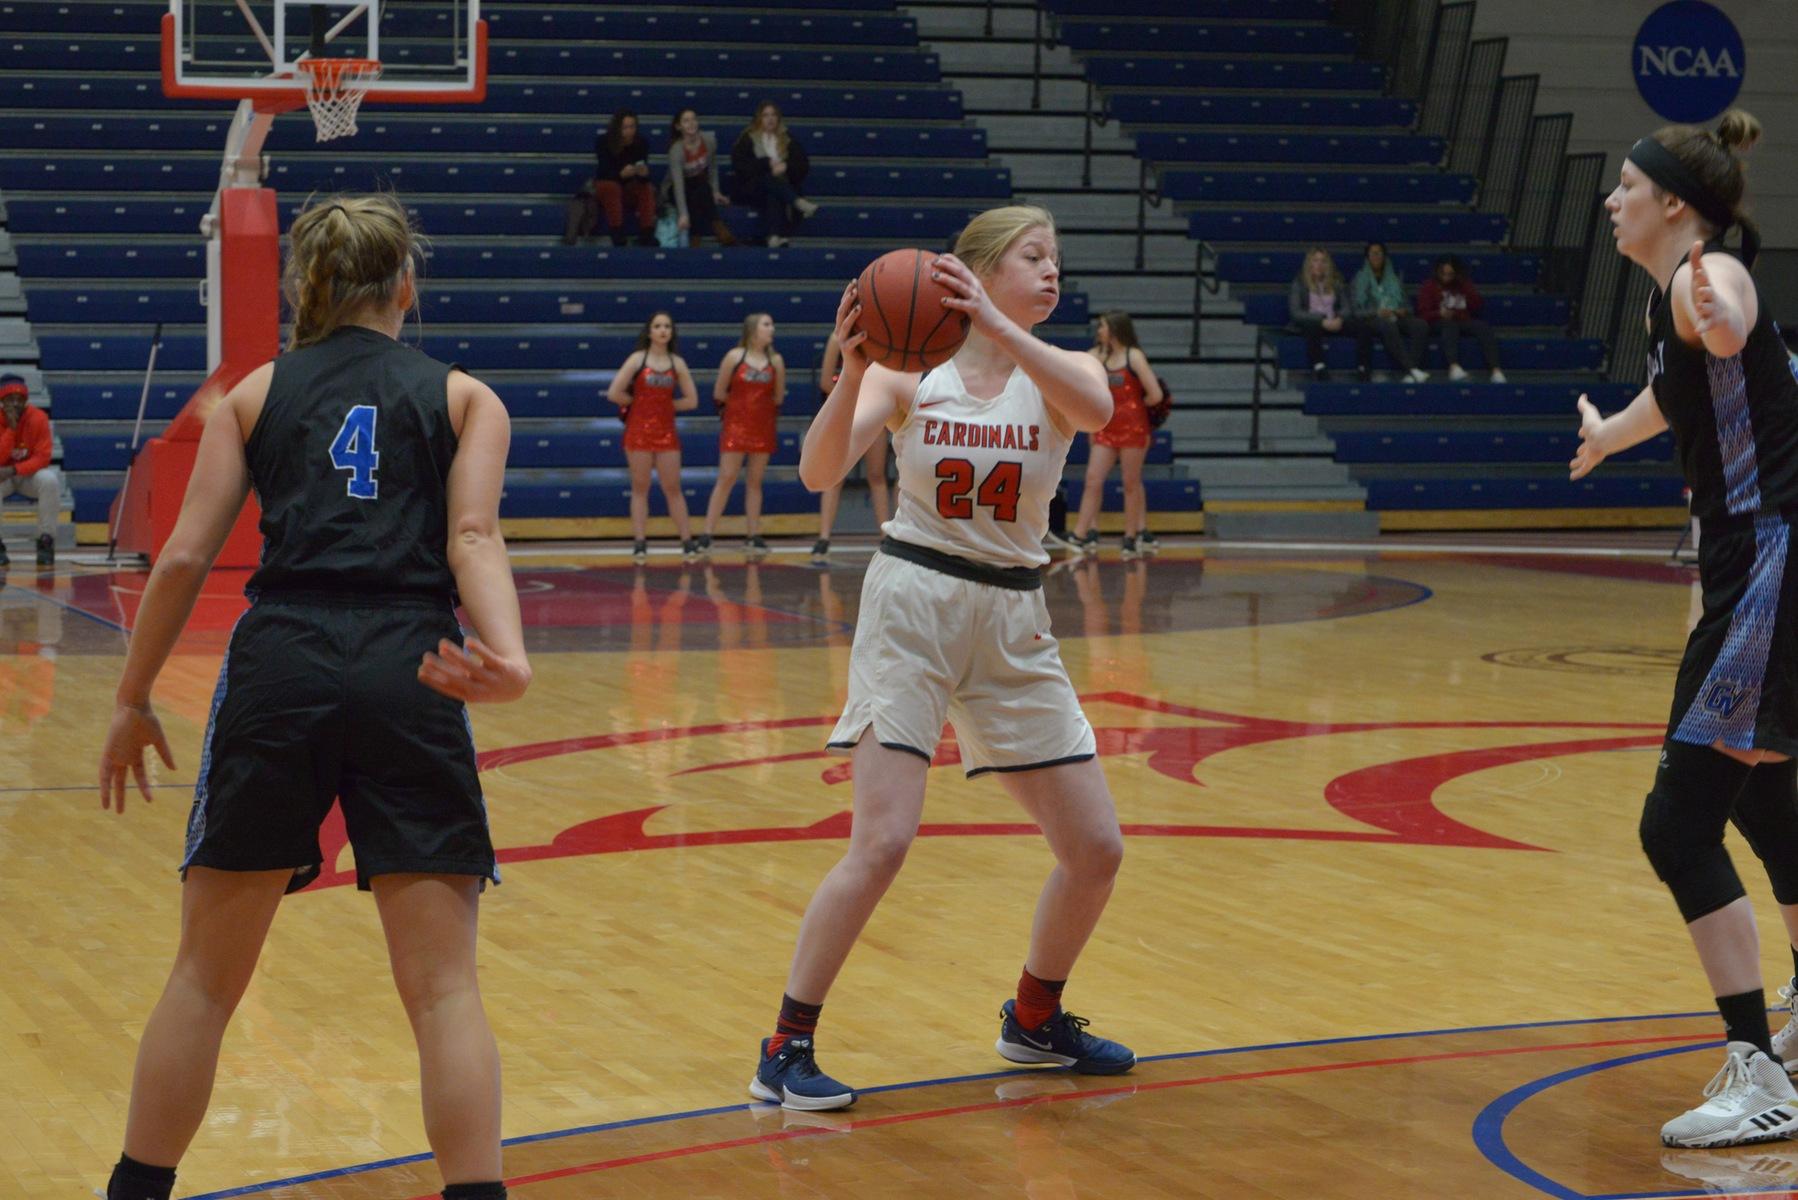 Women's Basketball vs Grand Valley - Jan. 18. 2020 - Saginaw Valley State